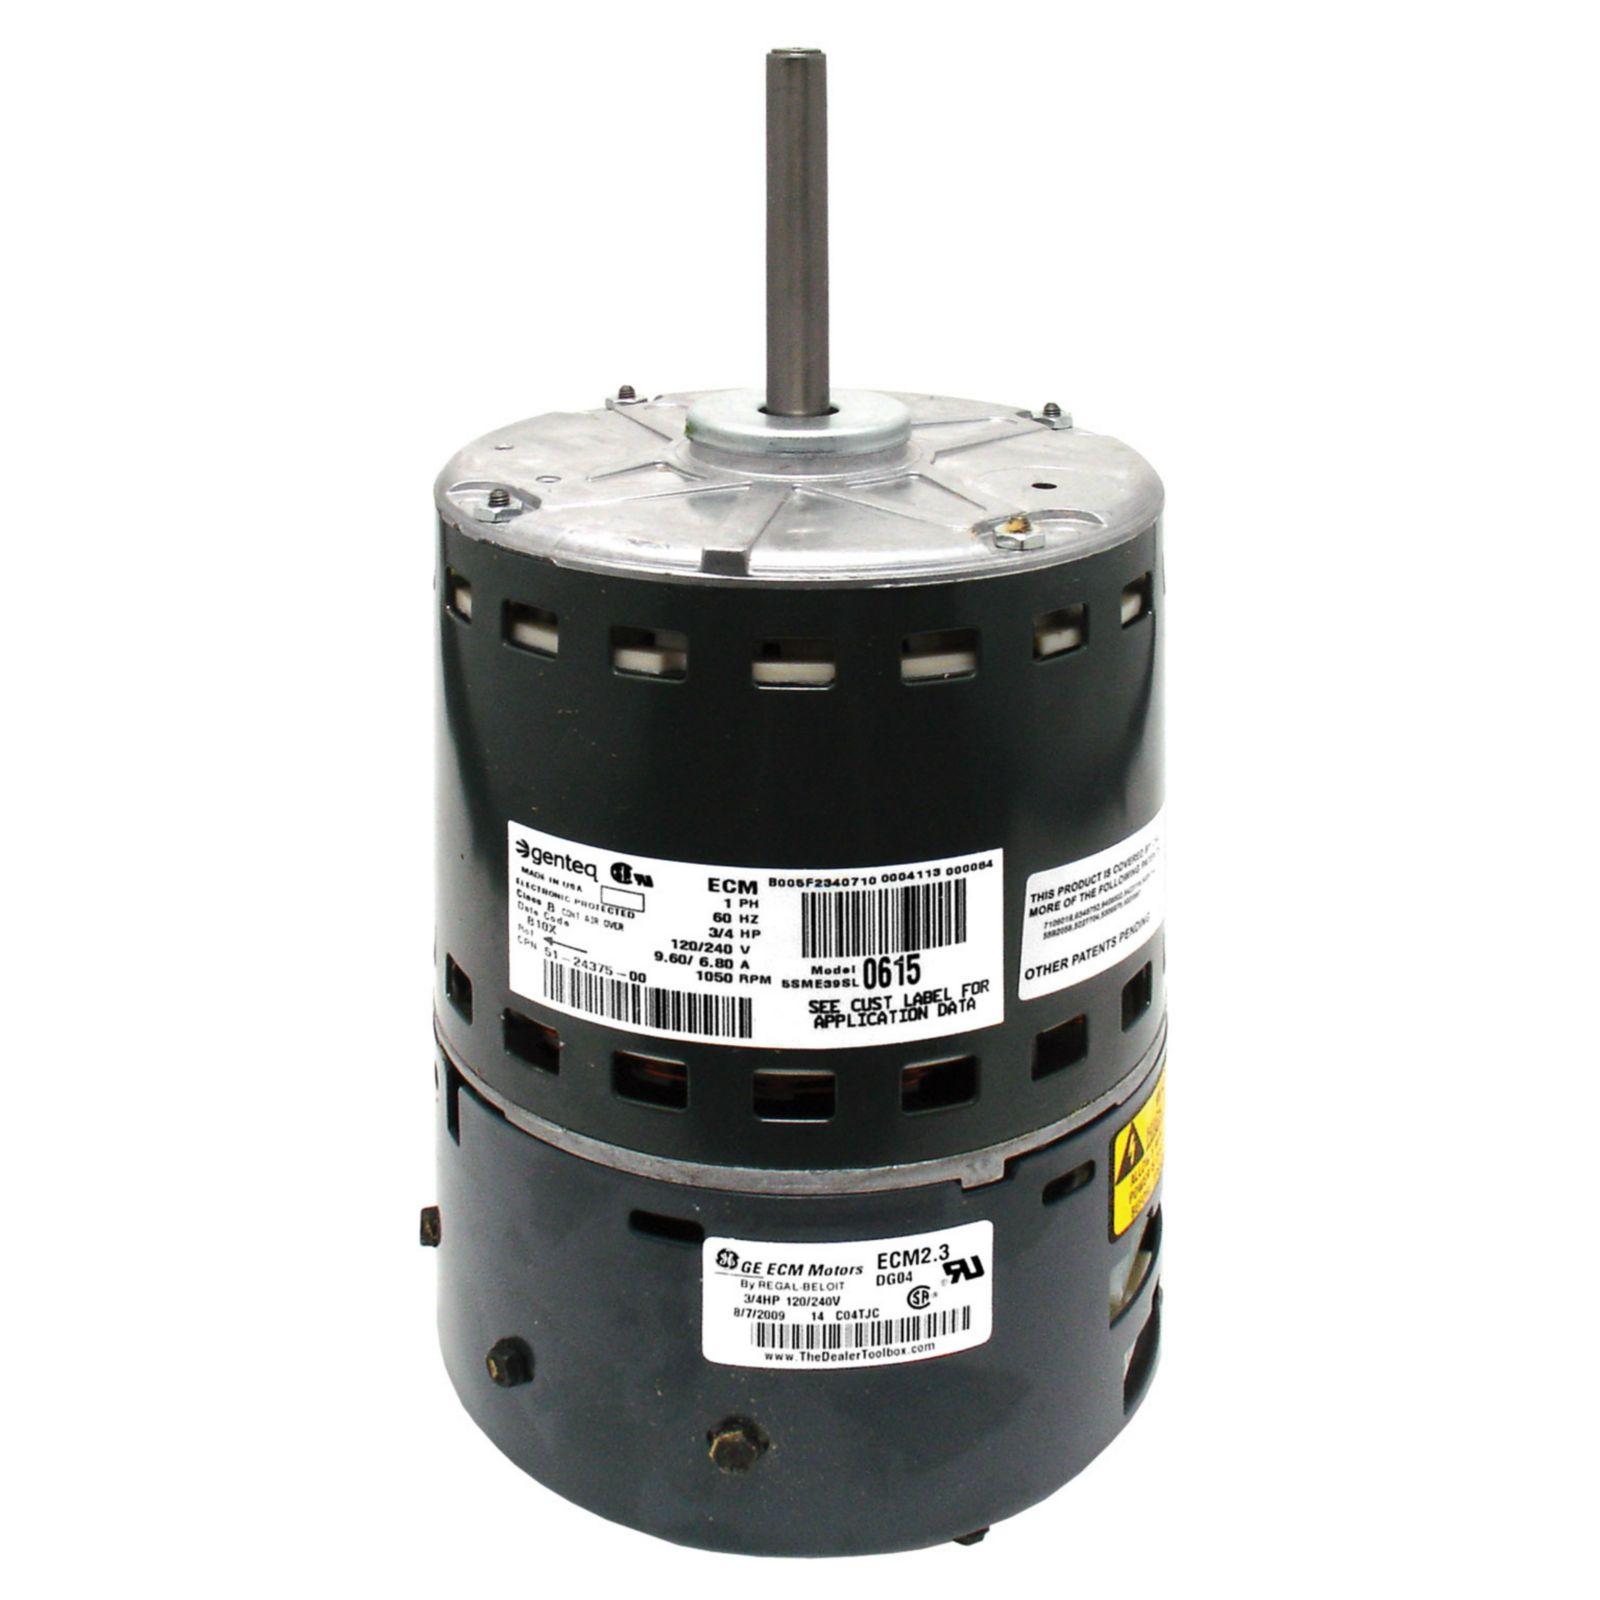 Rheem - 51-24375-15 Motor-direct Drive Ecm 3/4 Hp #PRO512437515